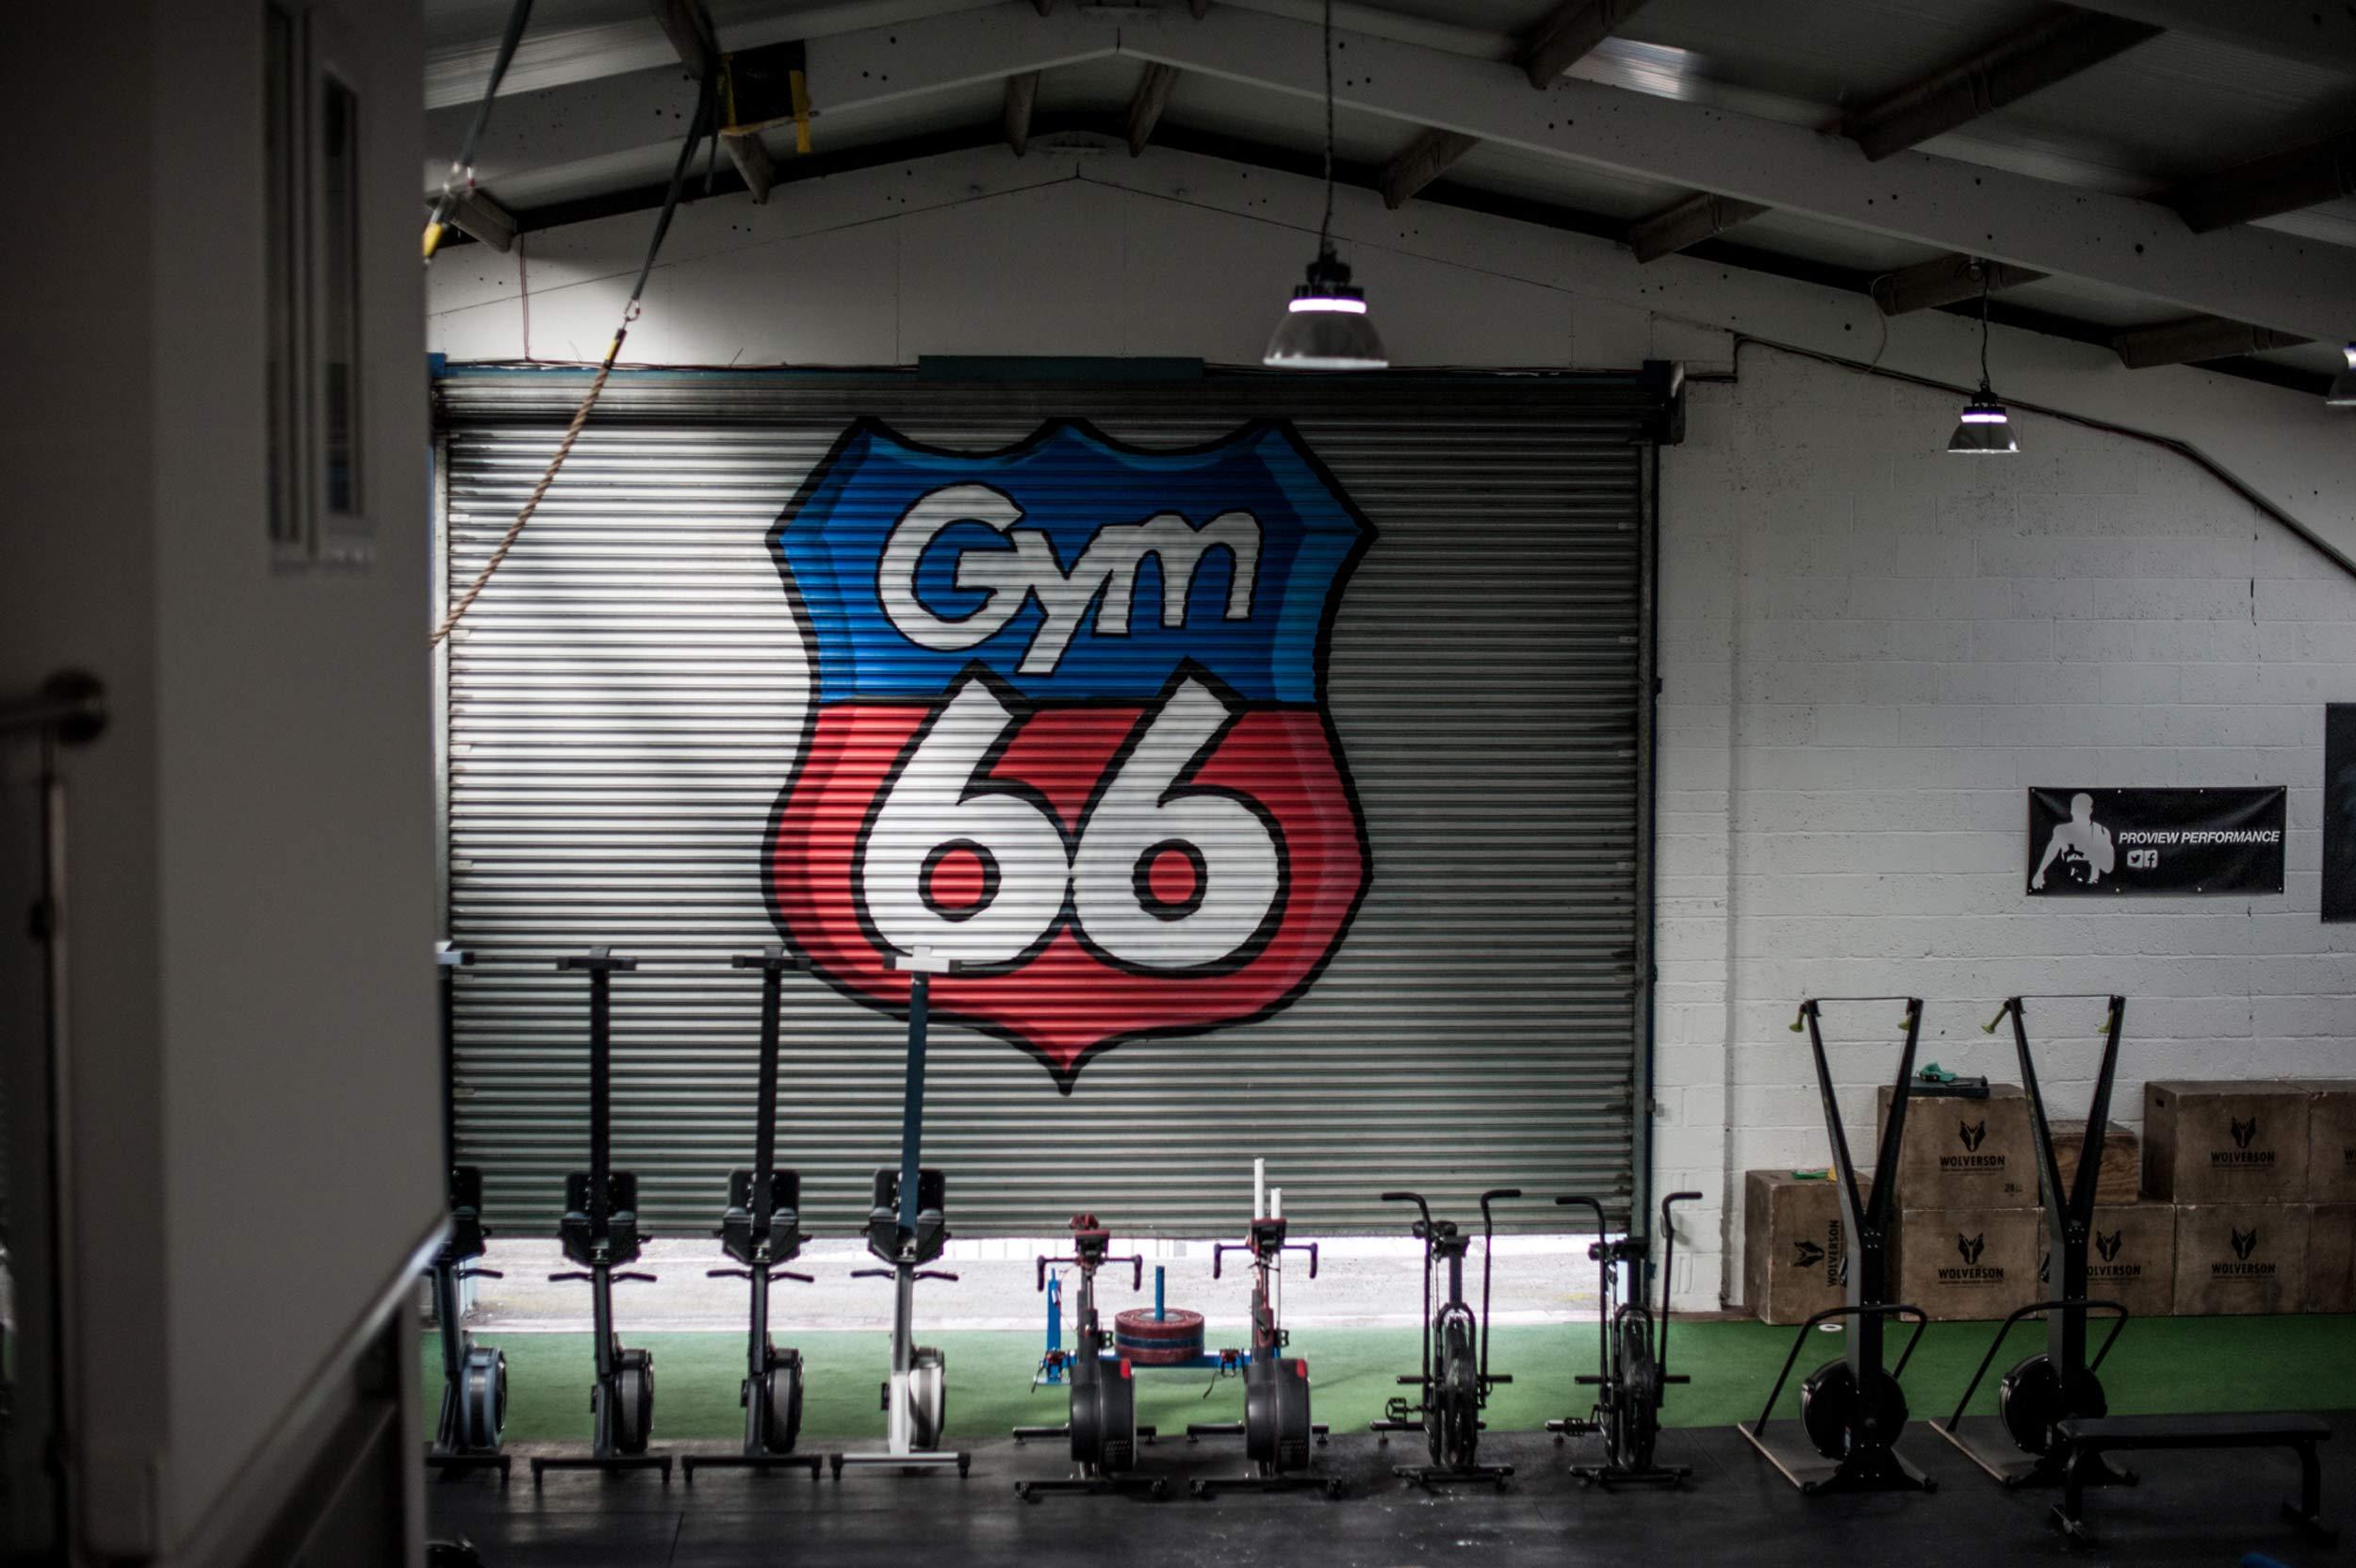 gym-66-cheltenham-strength-conditioning-_31.JPG